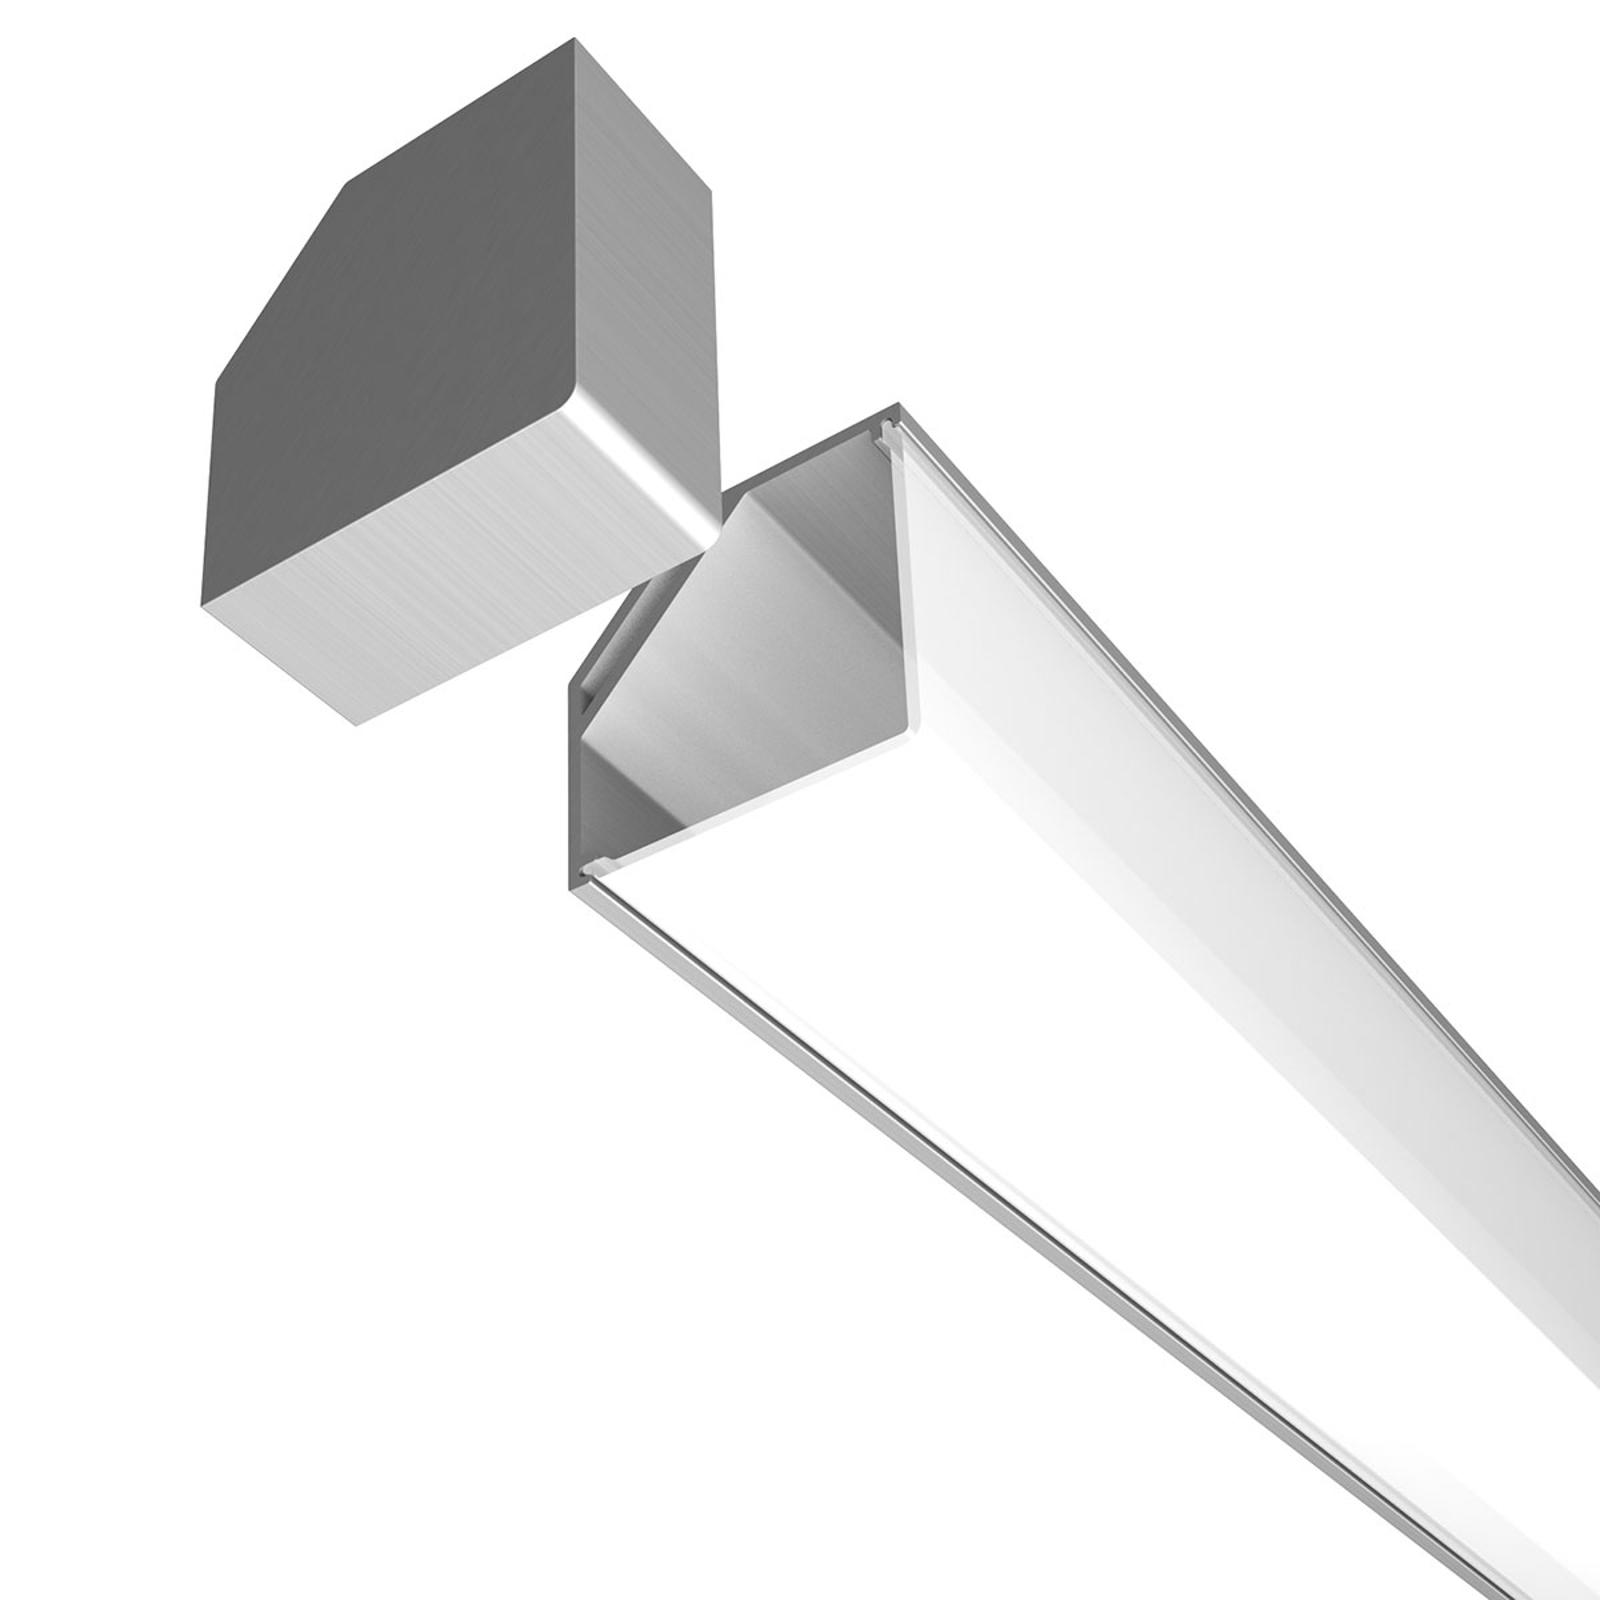 Endkappe für E45 Aluminium Eck-Profil